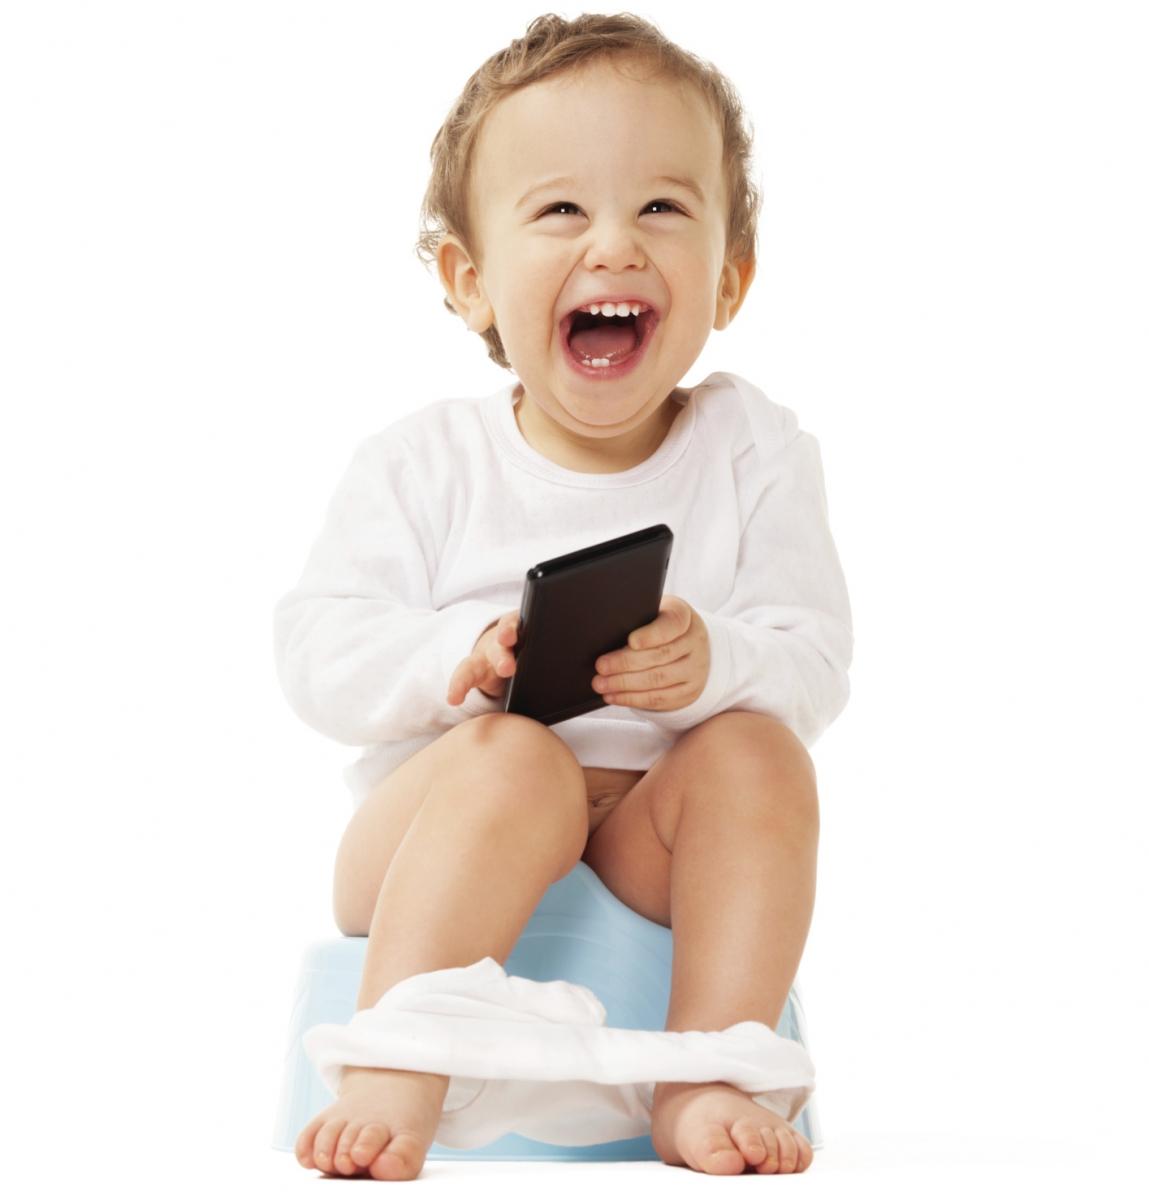 bda7ff377b9 Potty Train Your Child in Three Days - NJ Family